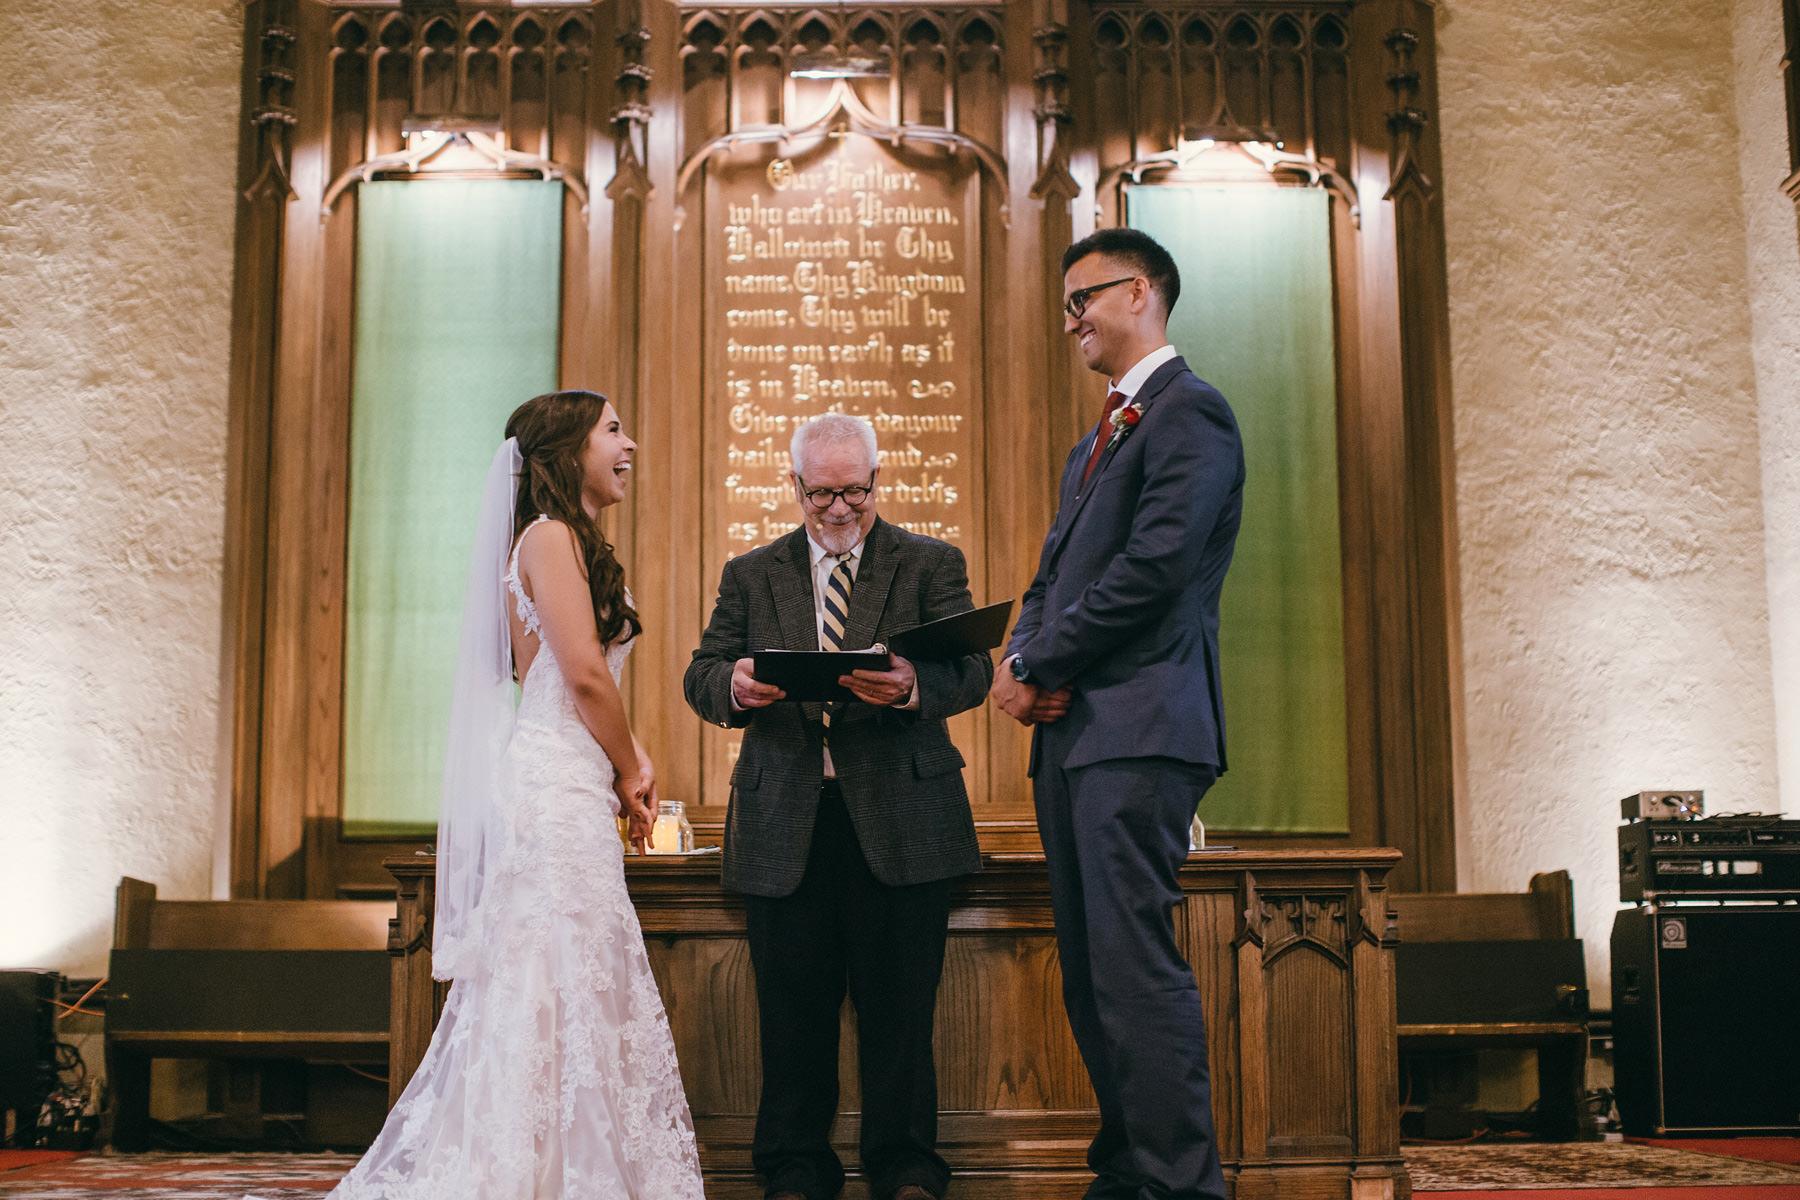 Kansas City Summer Wedding at the Guild_Kindling Wedding Photography Blog49.JPG